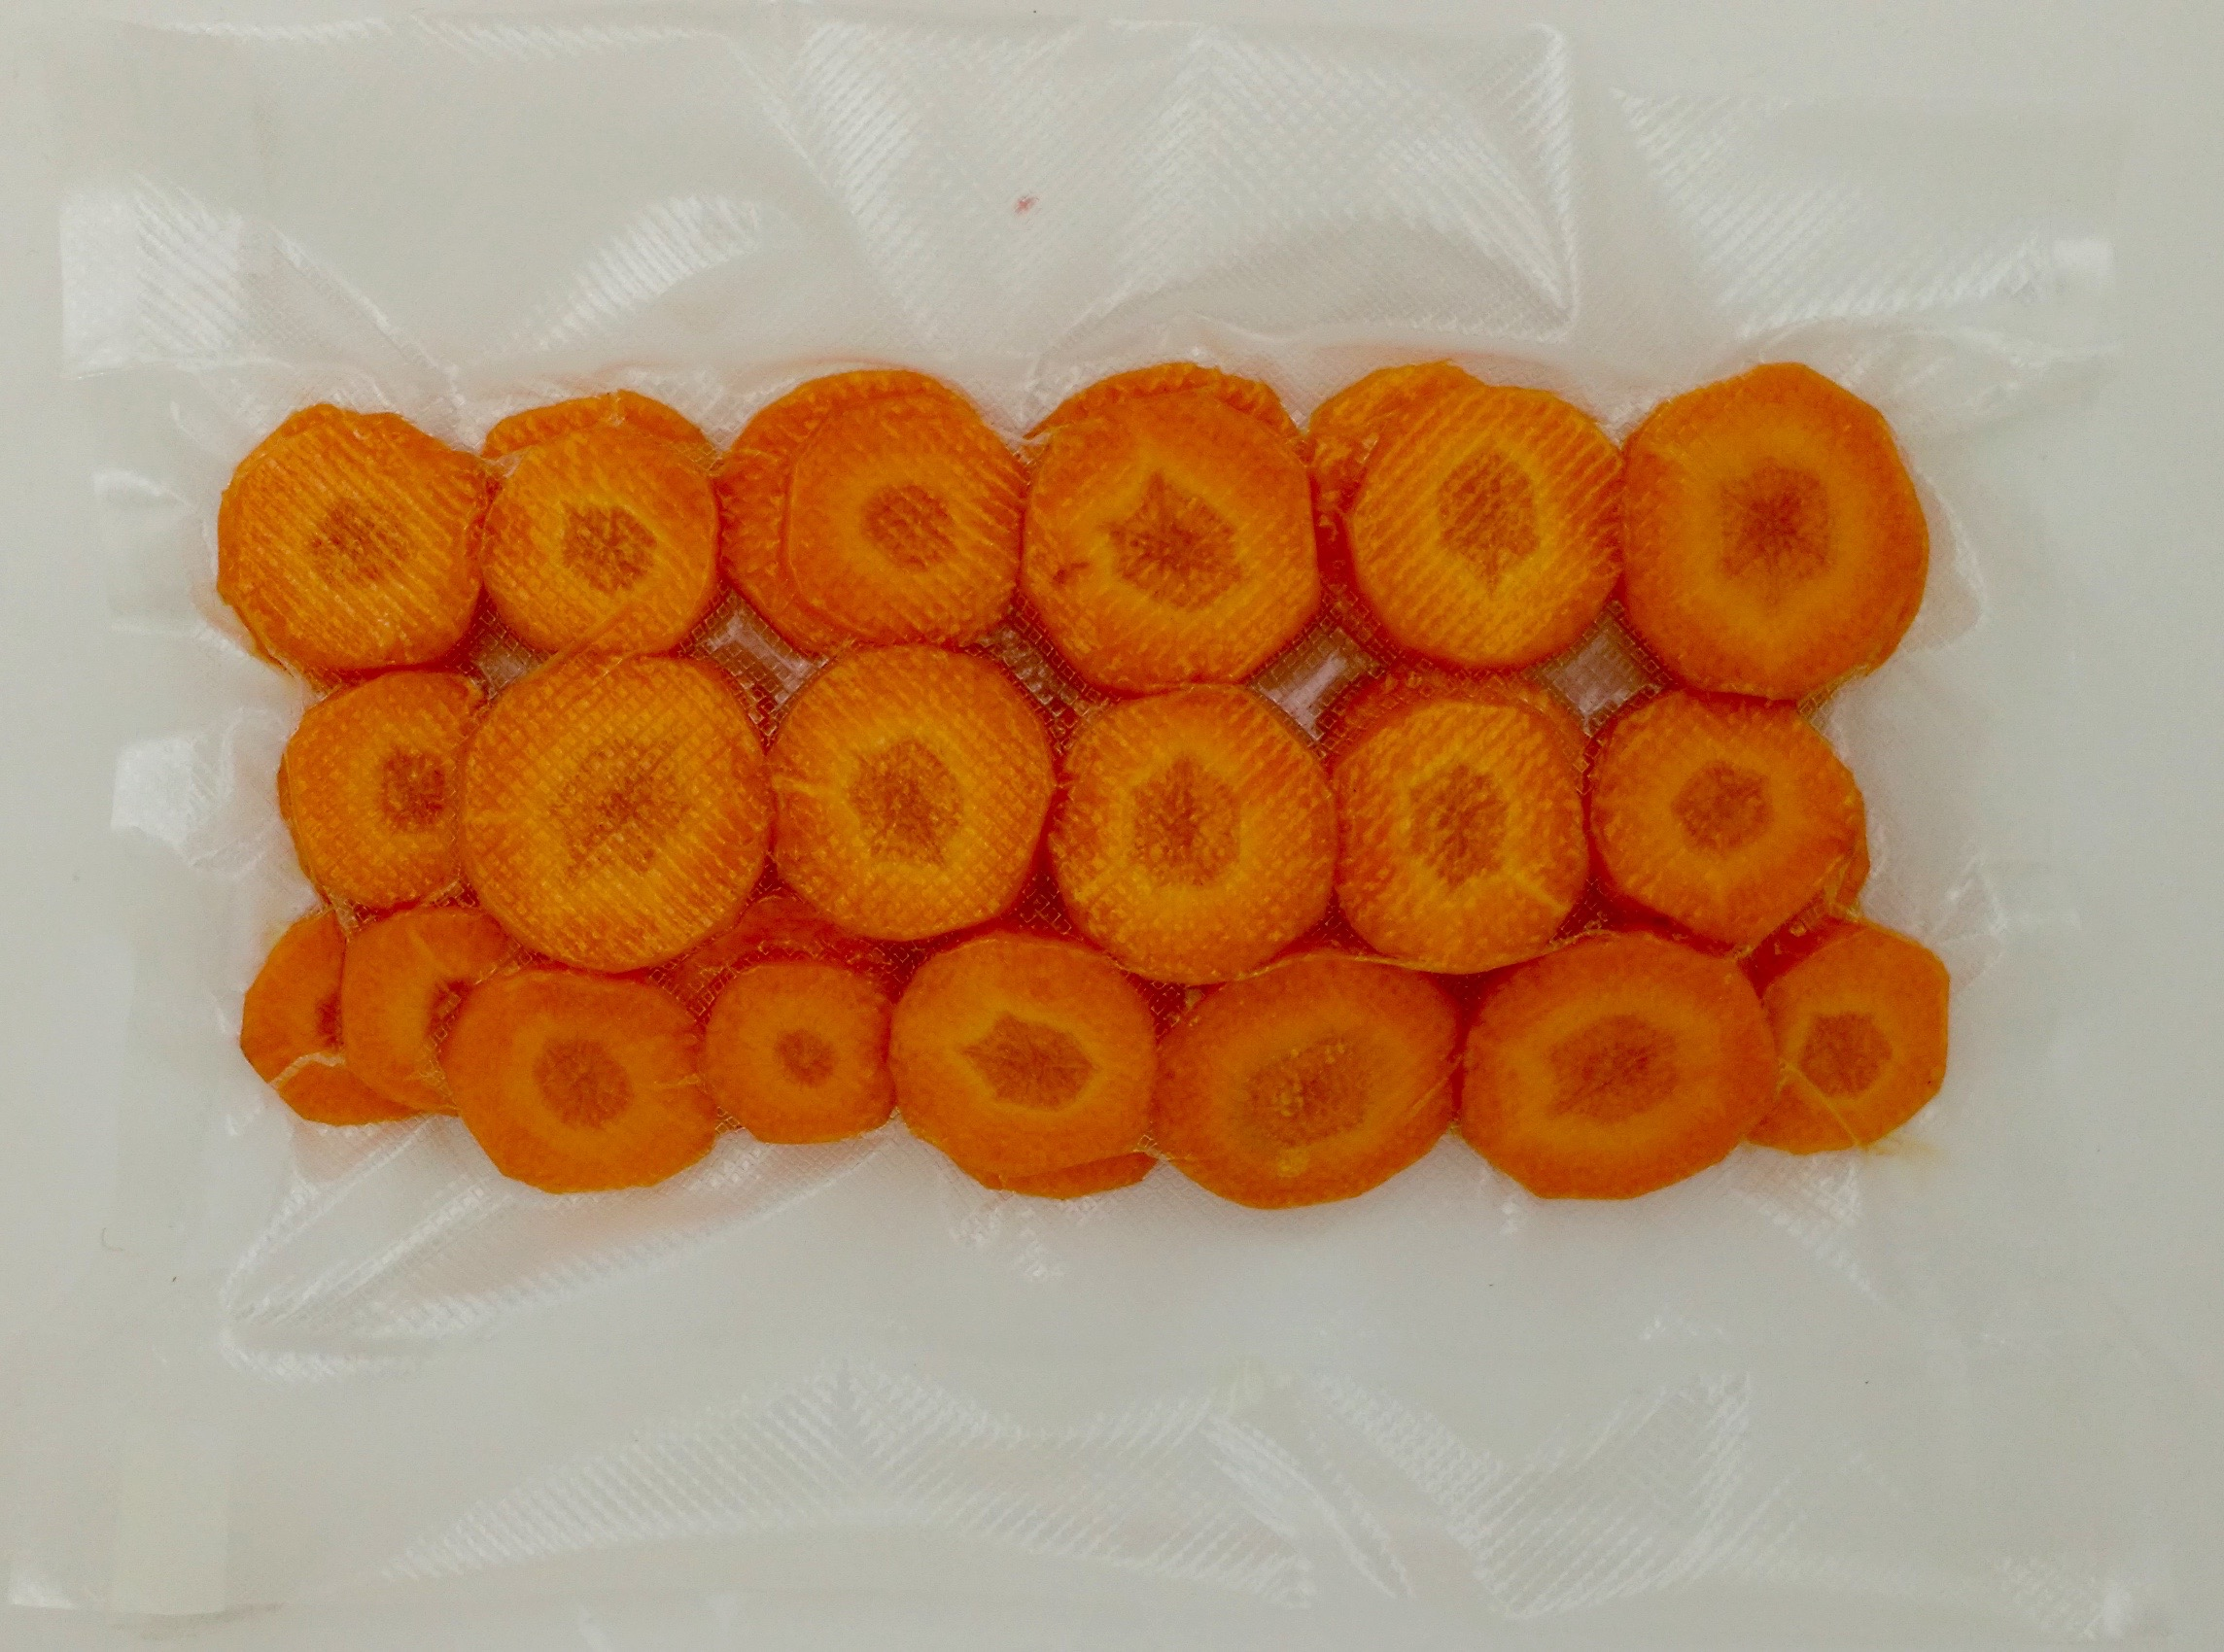 Carottes en rondelles (environ 200 g)